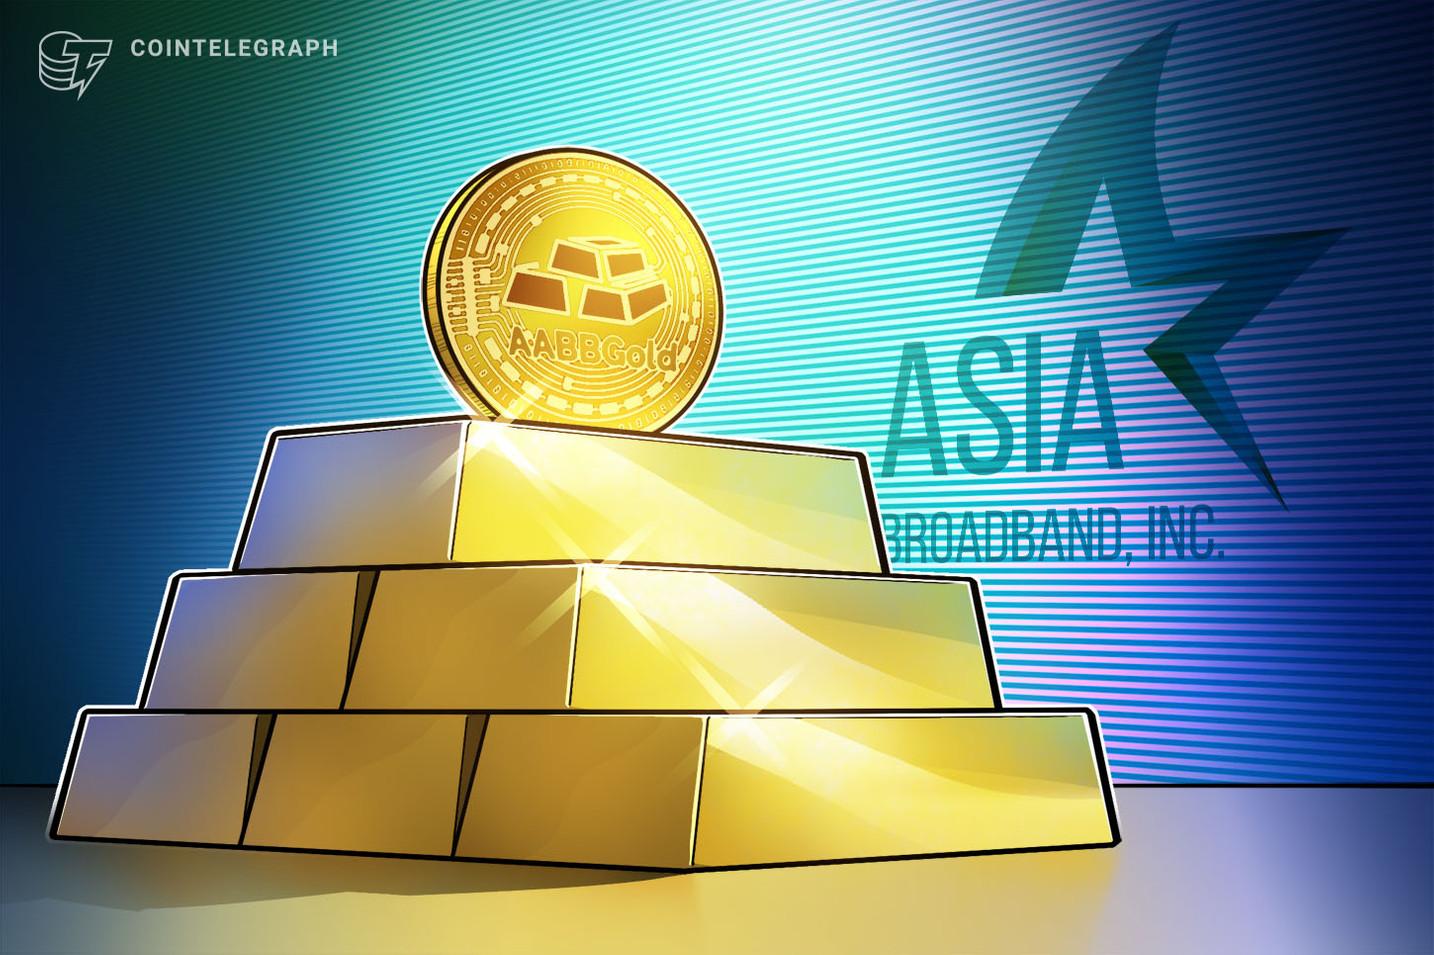 Bullish on bullion? This crypto project has a golden proposition